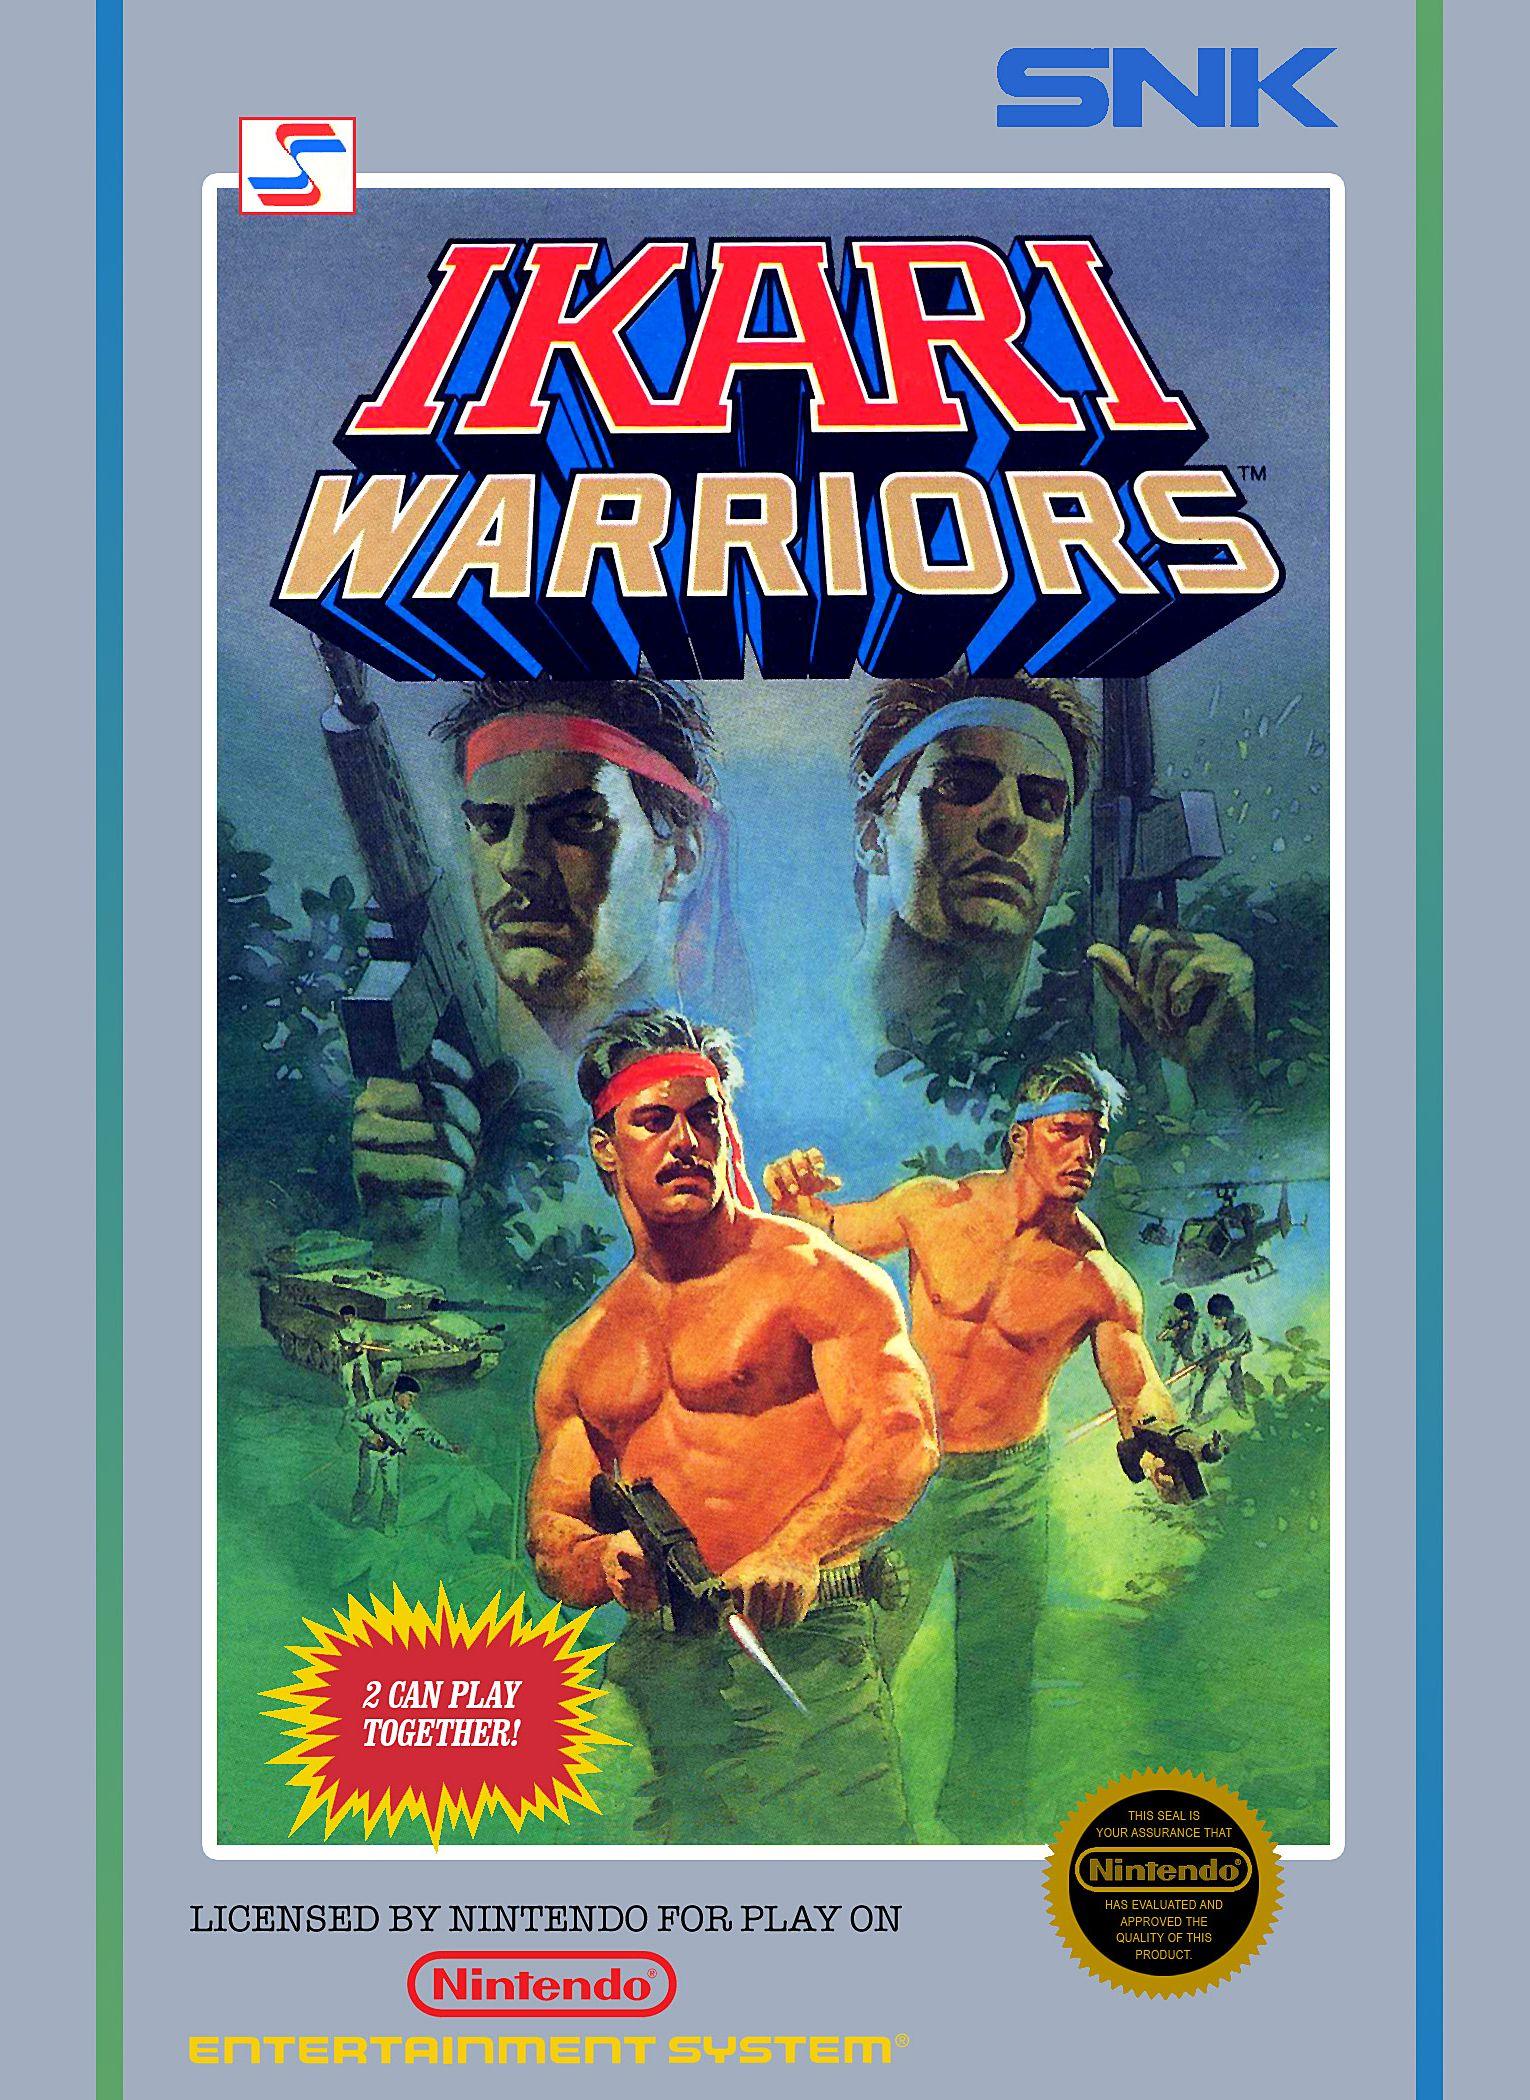 ikari warriors nes cover Google Search Nintendo nes